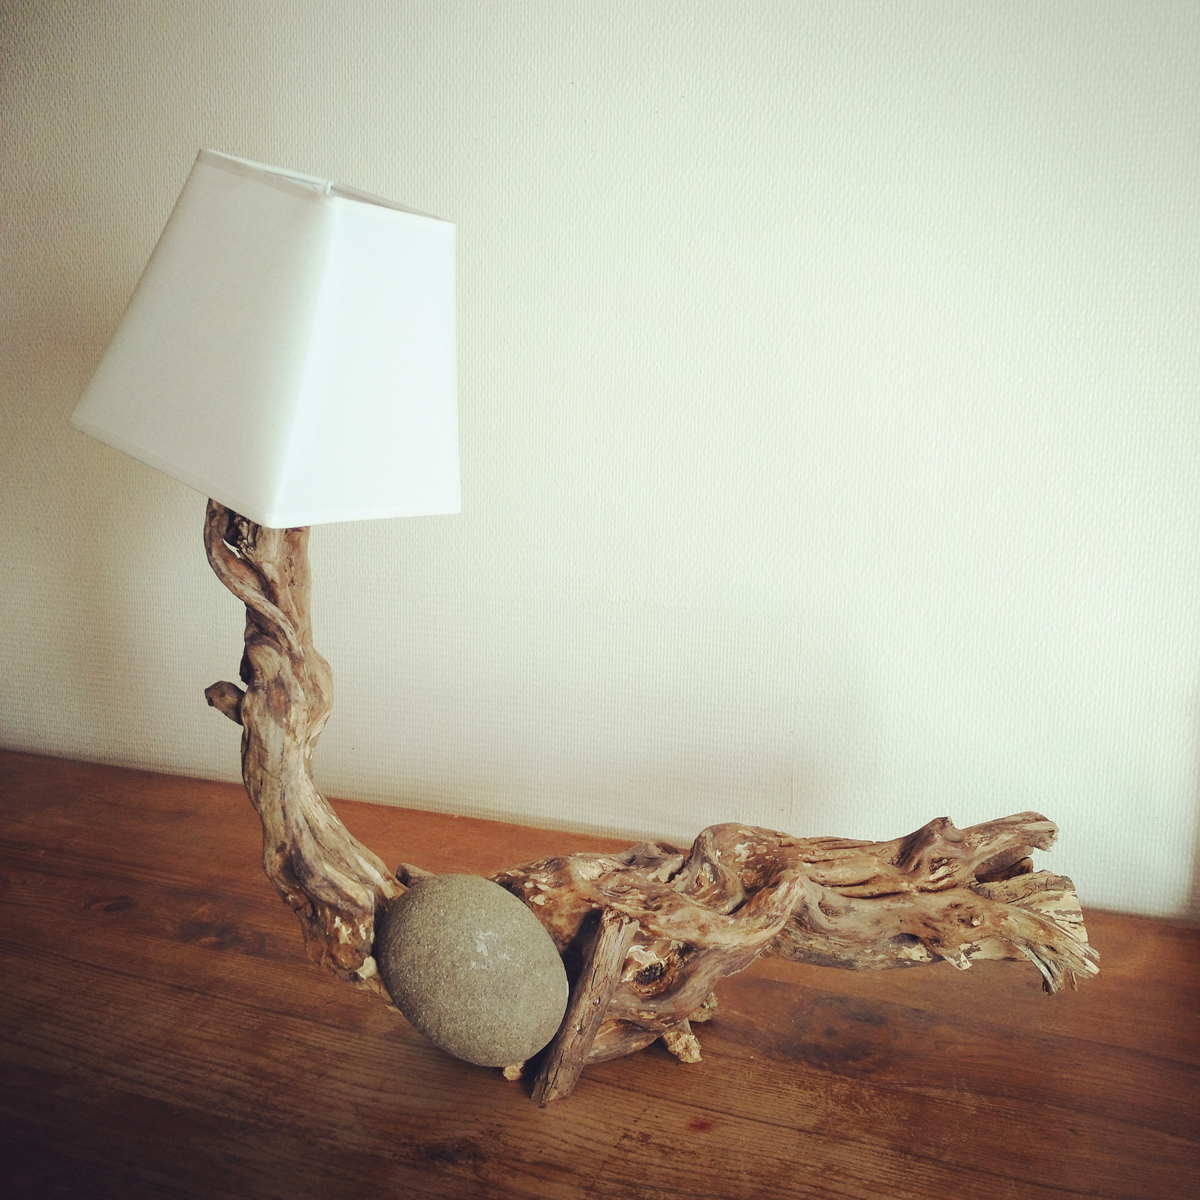 Lampe bois flotté et pierre - Art by Ze studio Annecy